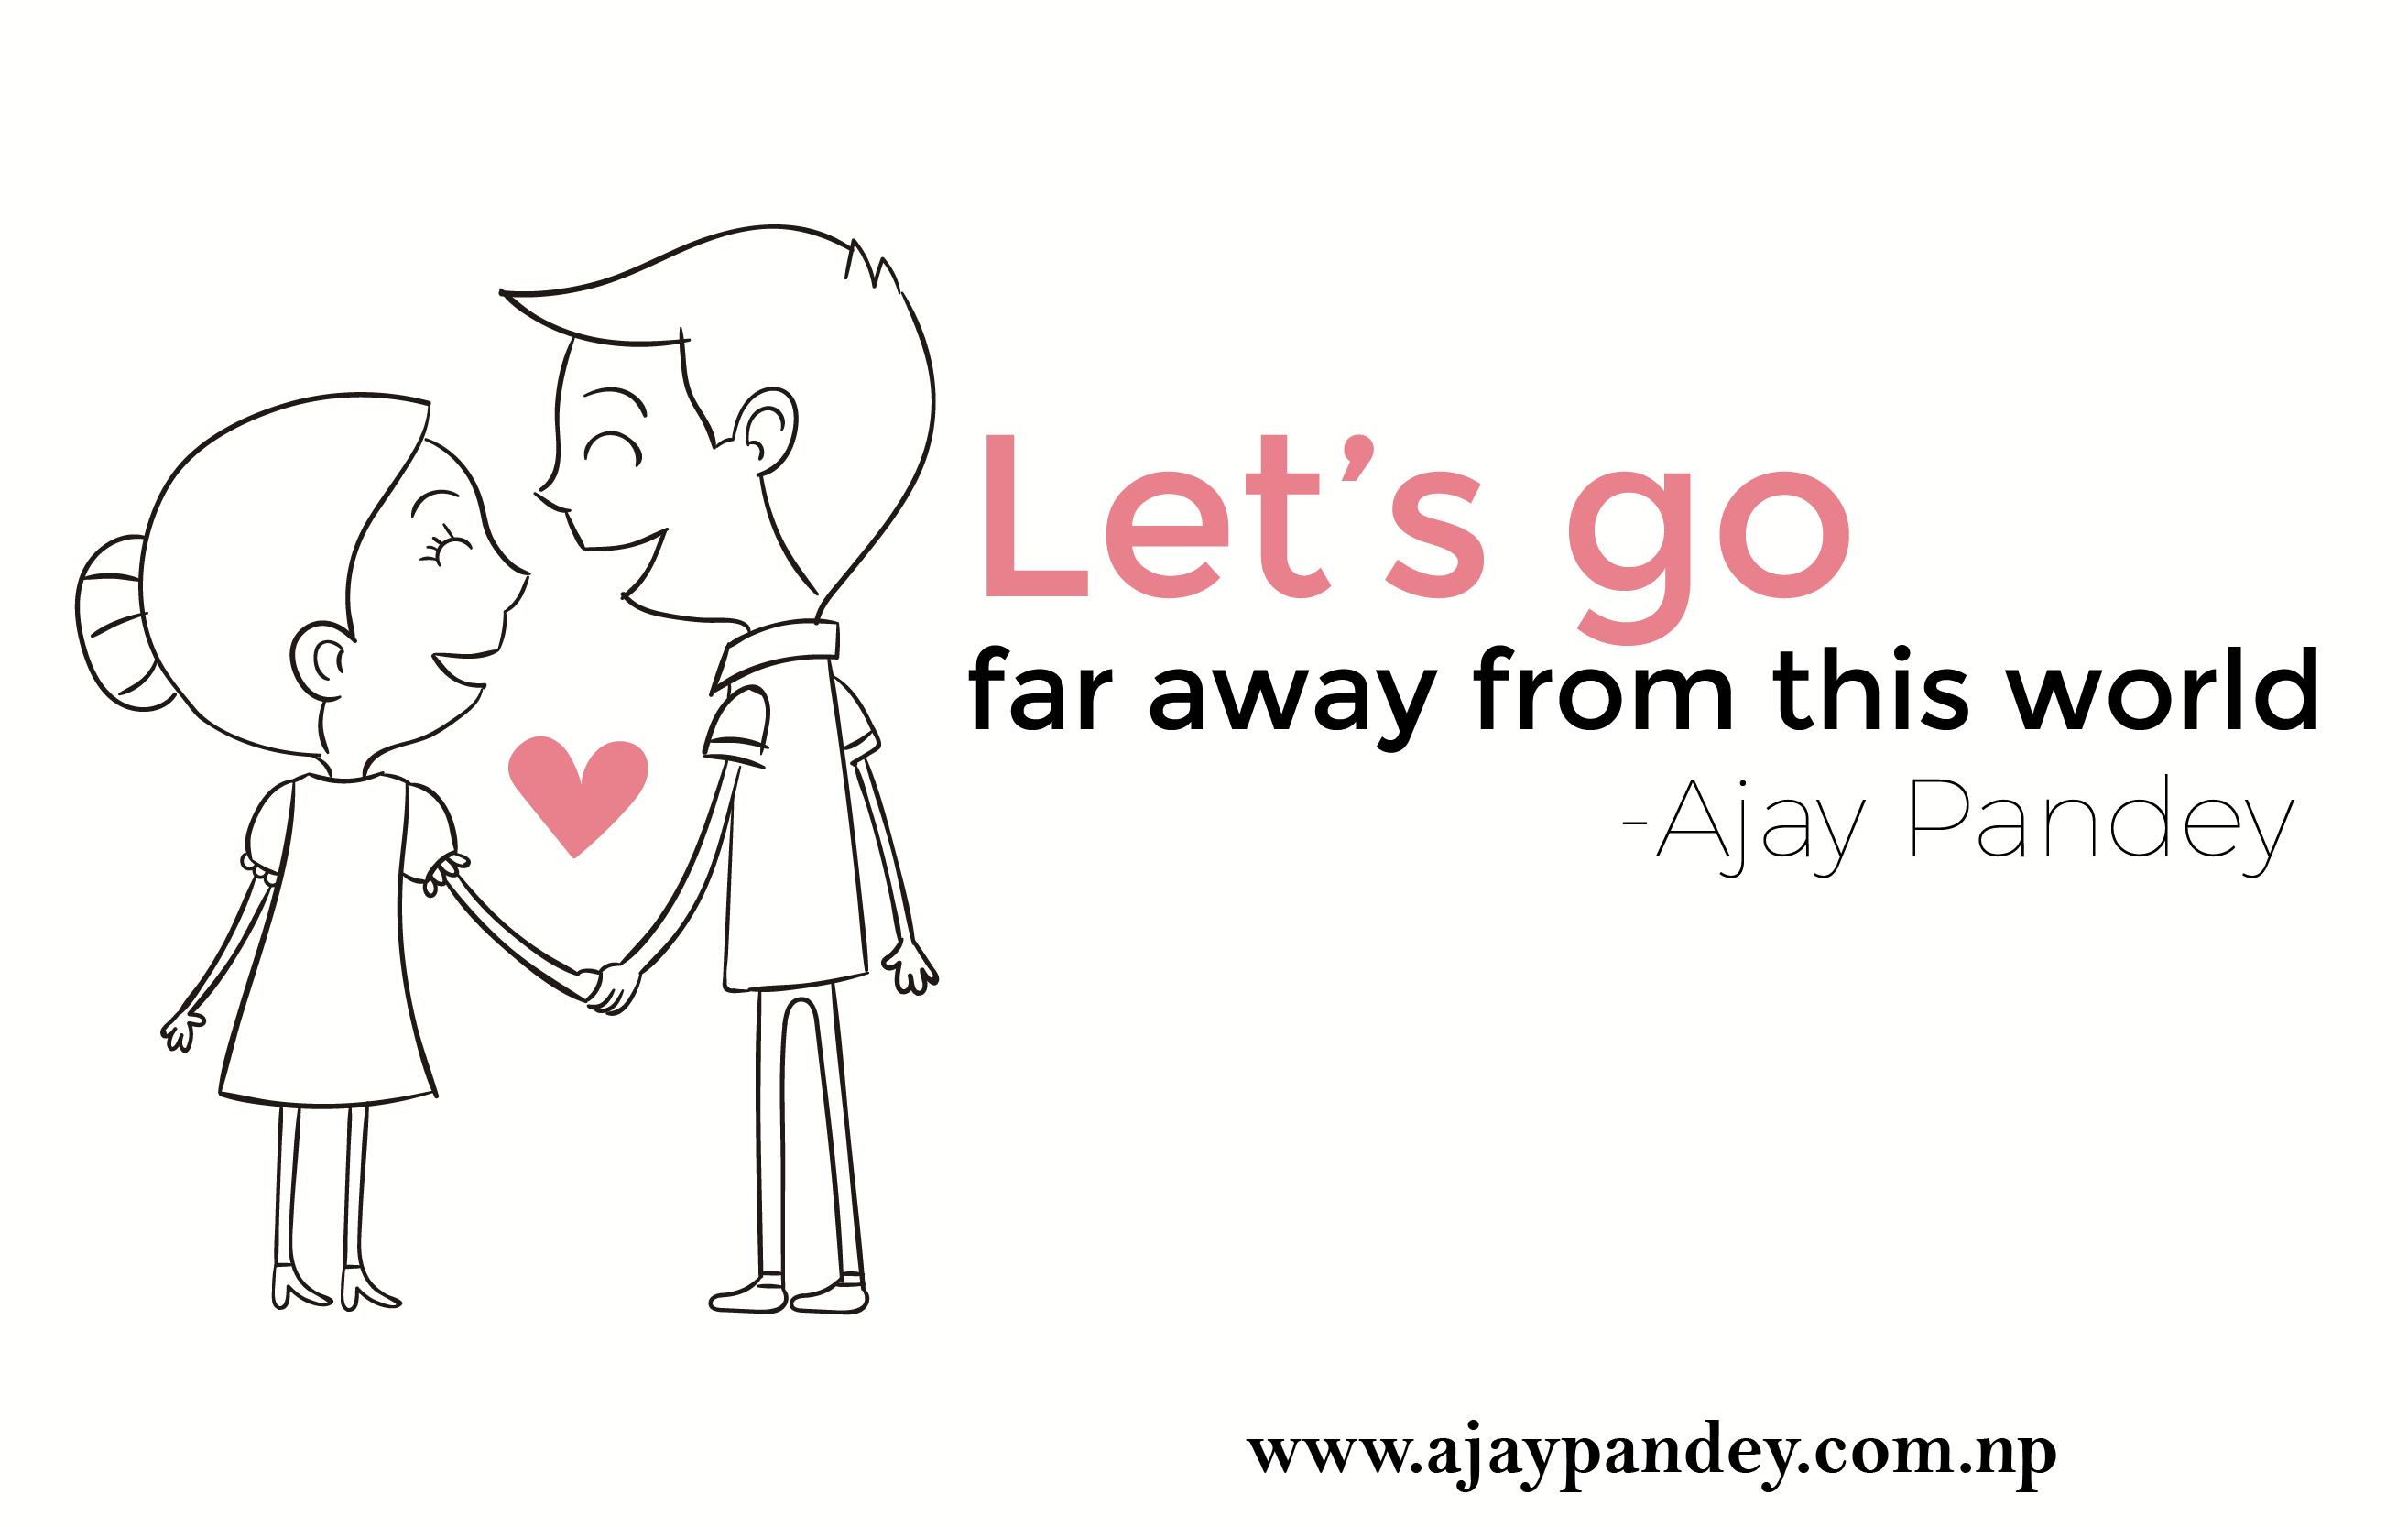 lets go far away | Ajay Pandey Nepal Love, Peace,World, Ajay, Pandey,